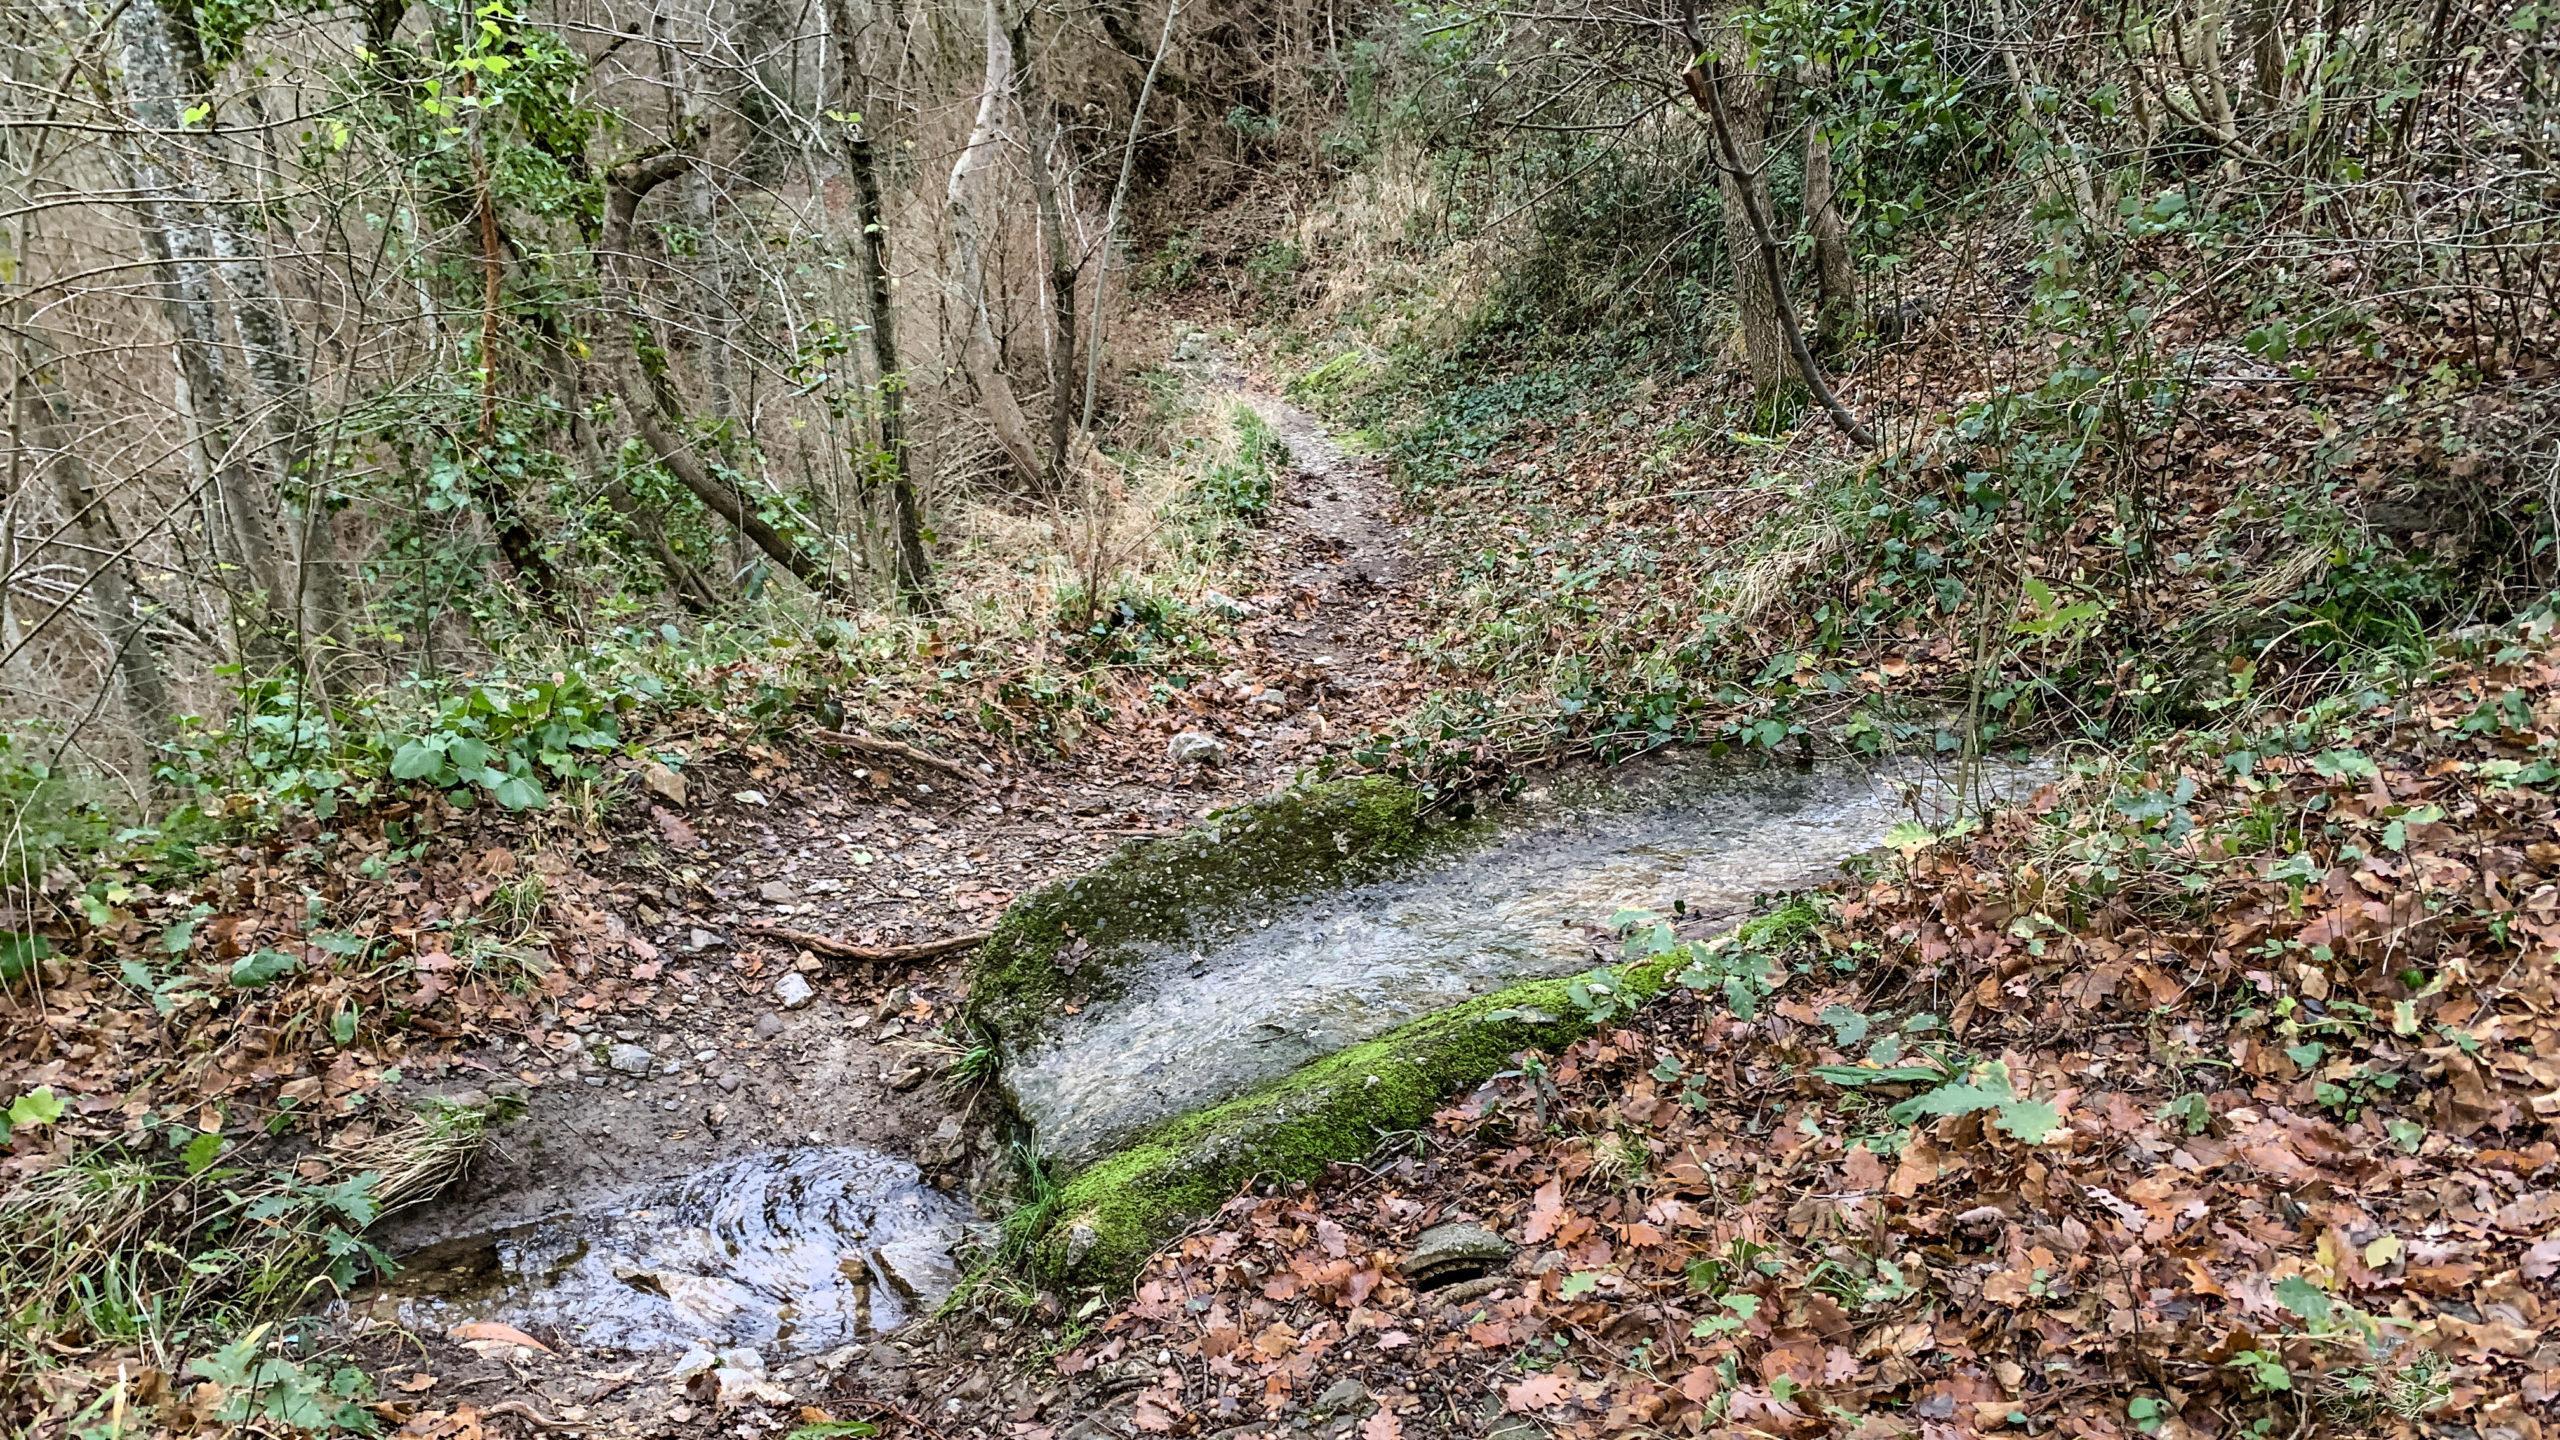 Gorges de Saint-Jaume: Wasserleitung kreuzen den Wanderweg. Foto: Hilke Maunder